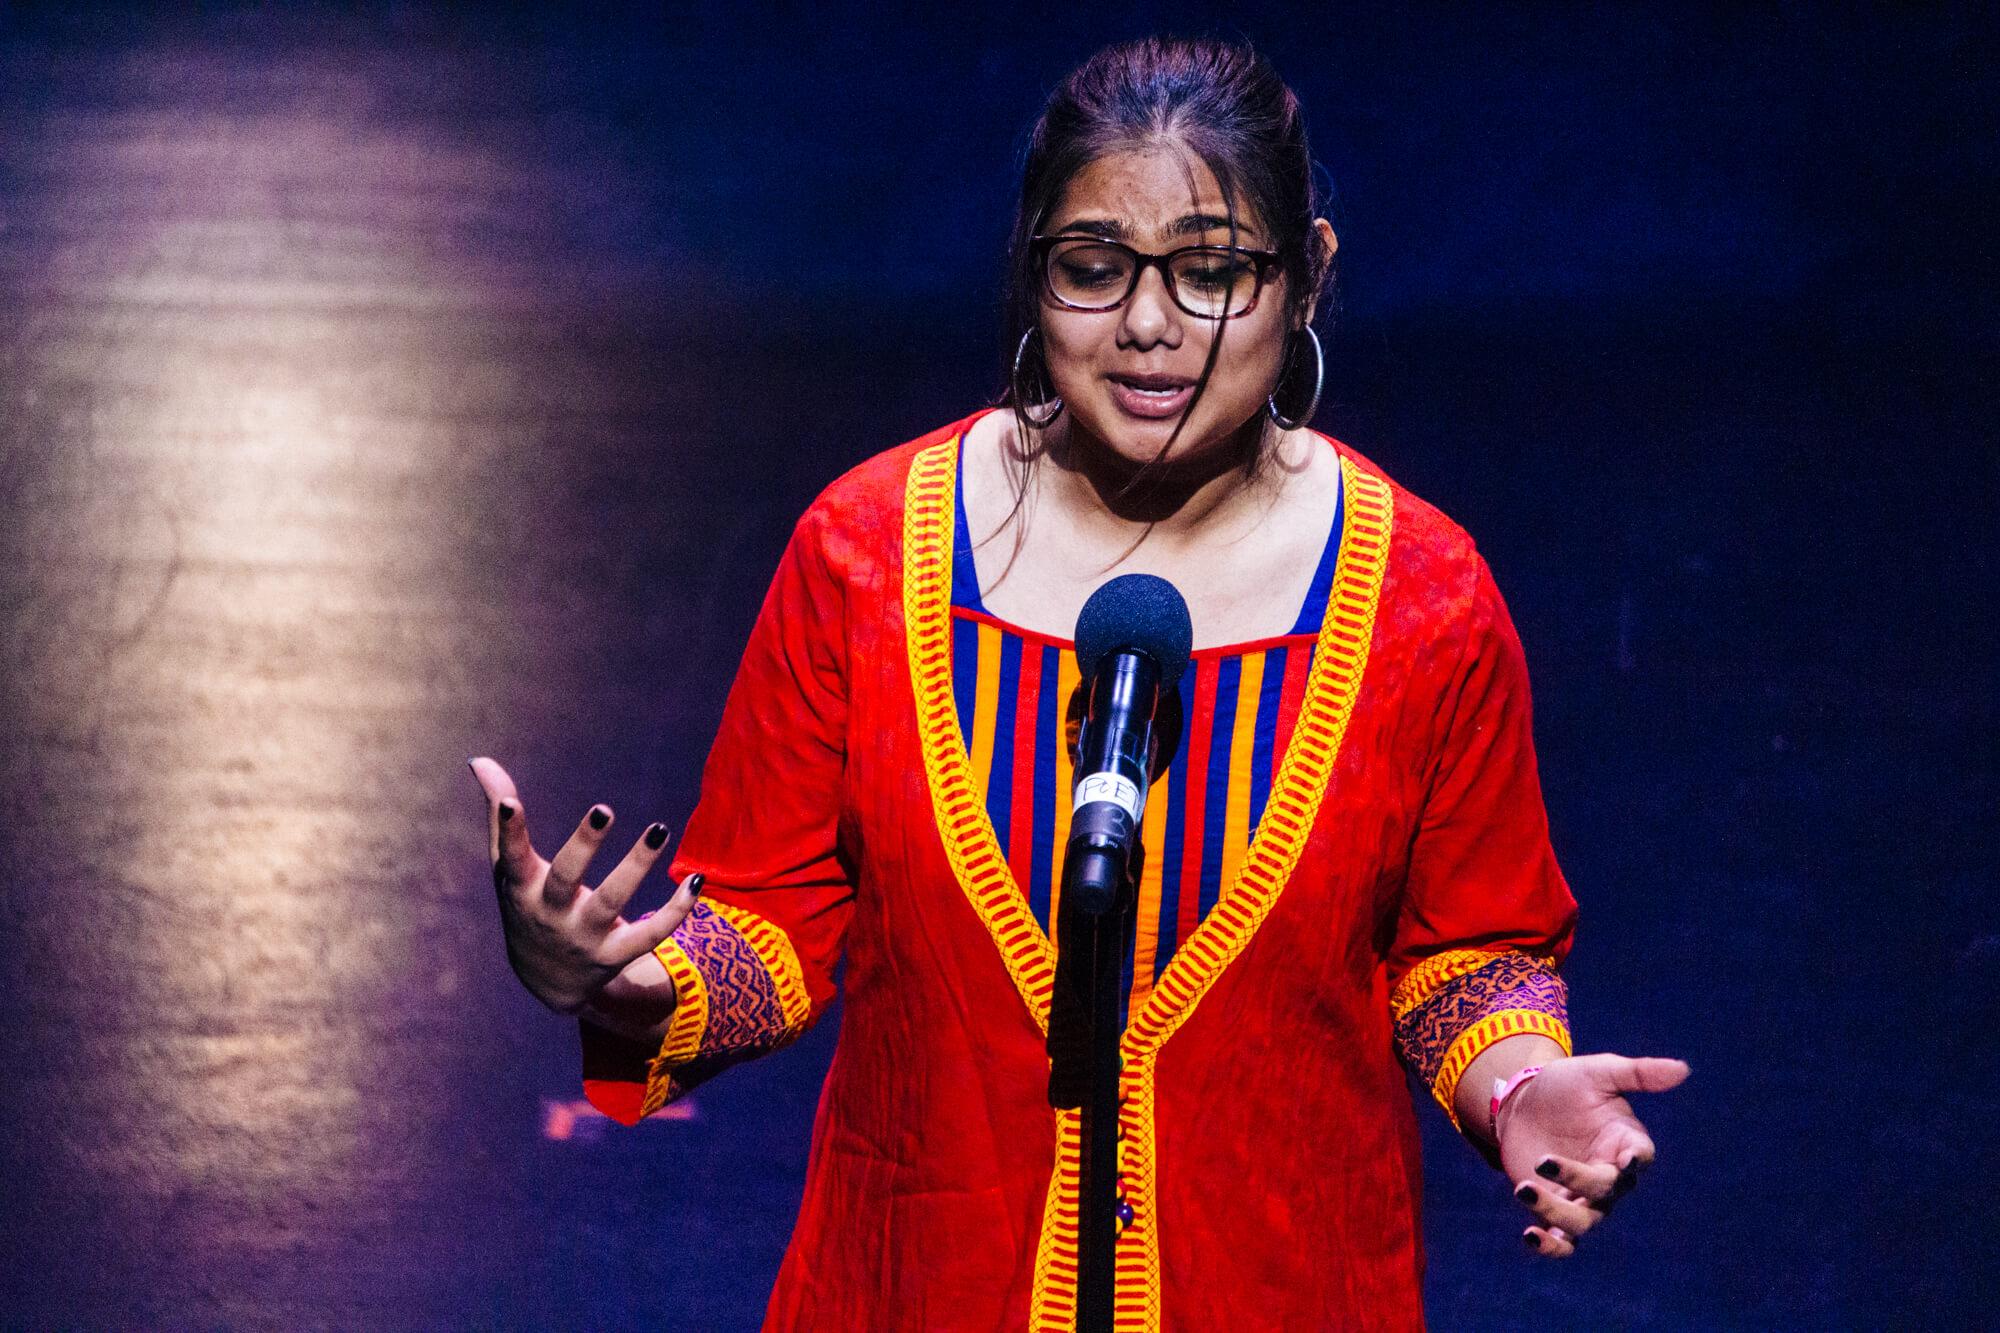 Aryanna Khan